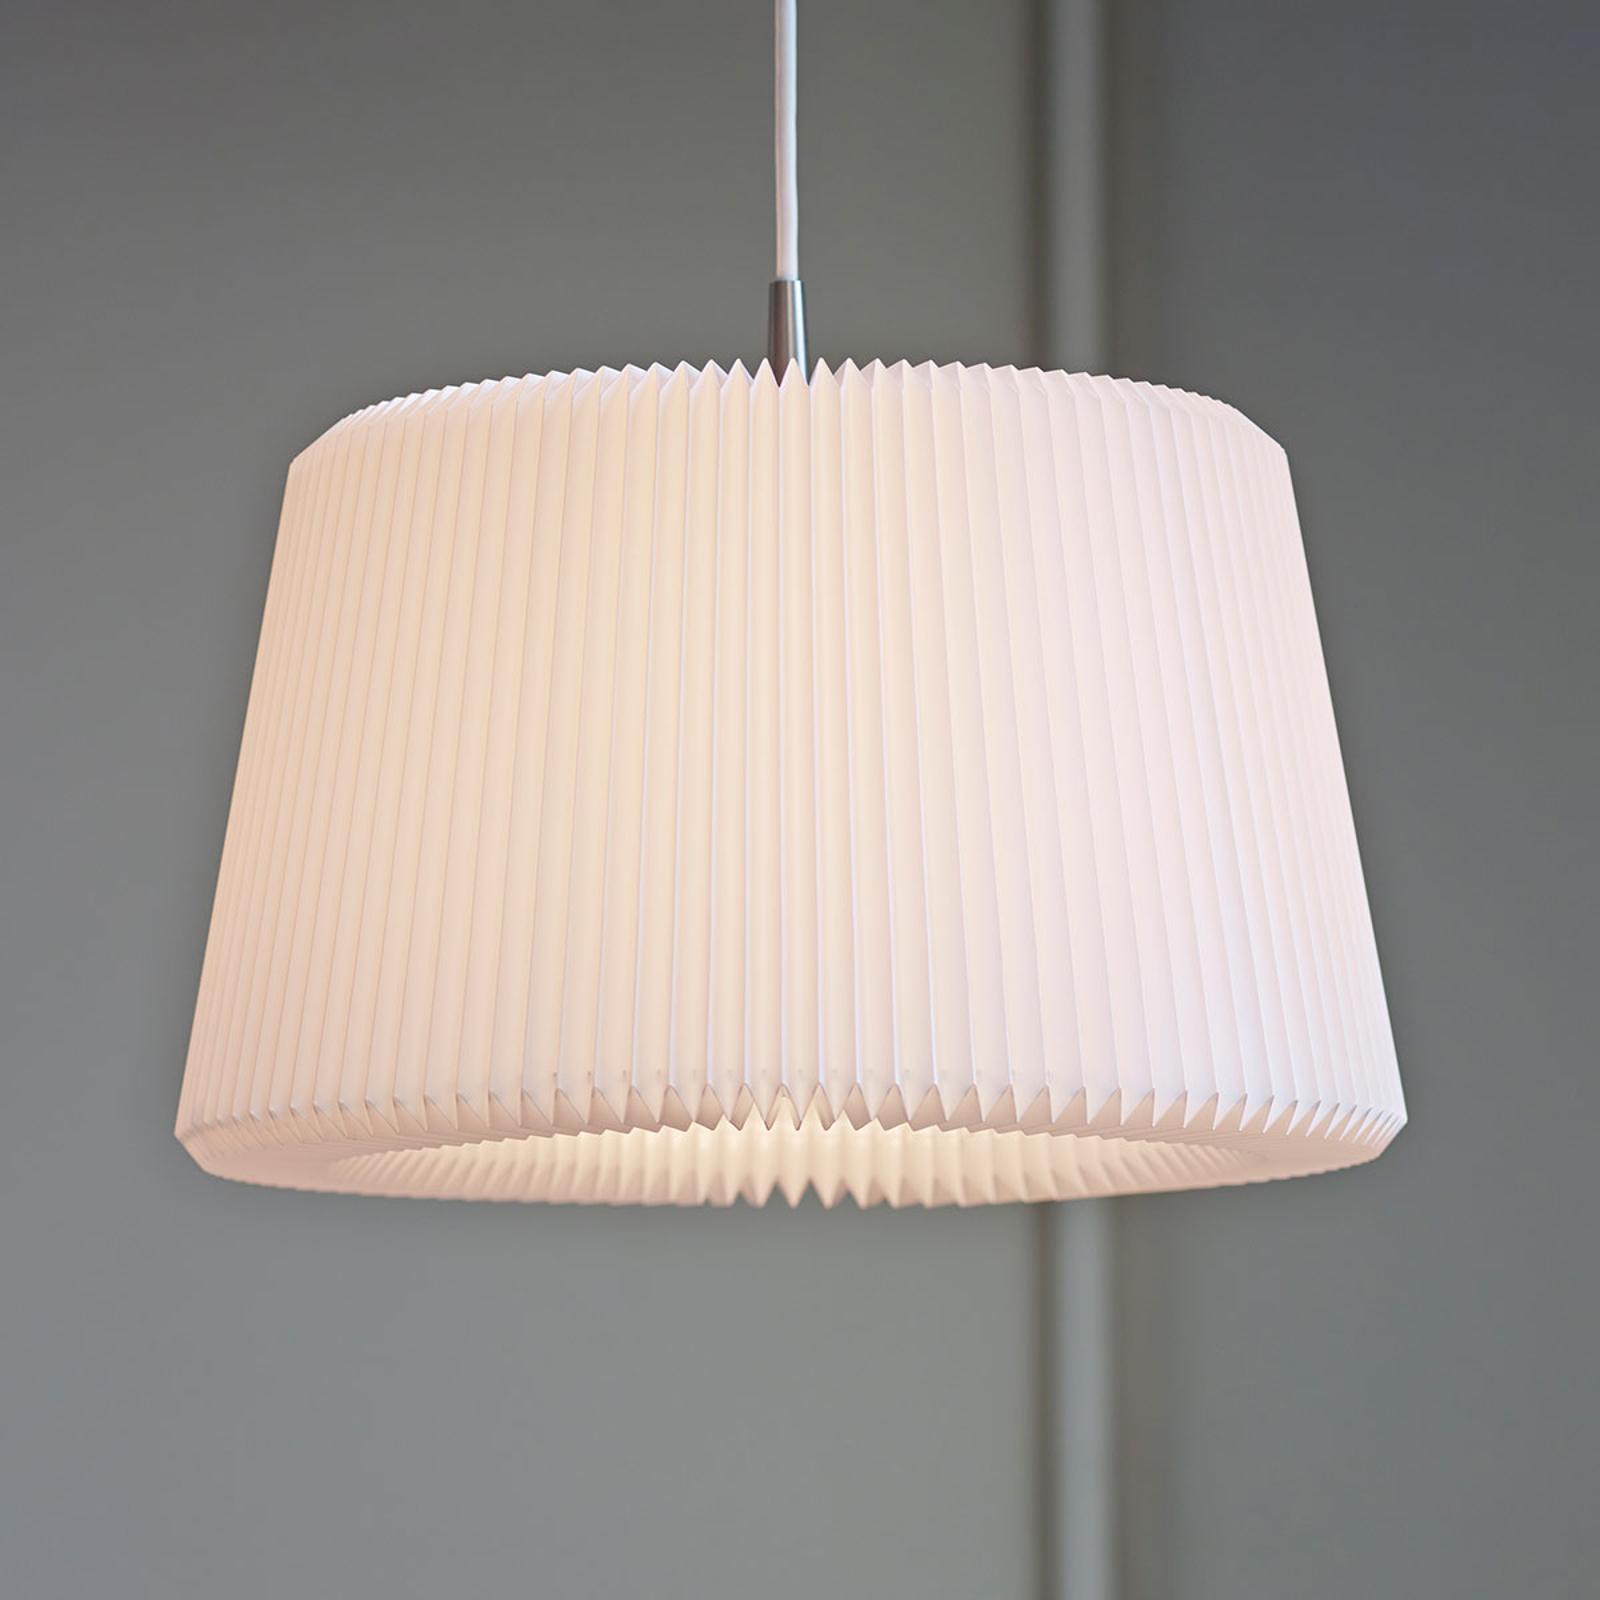 LE KLINT Snowdrop L - lampa wisząca z tworzywa